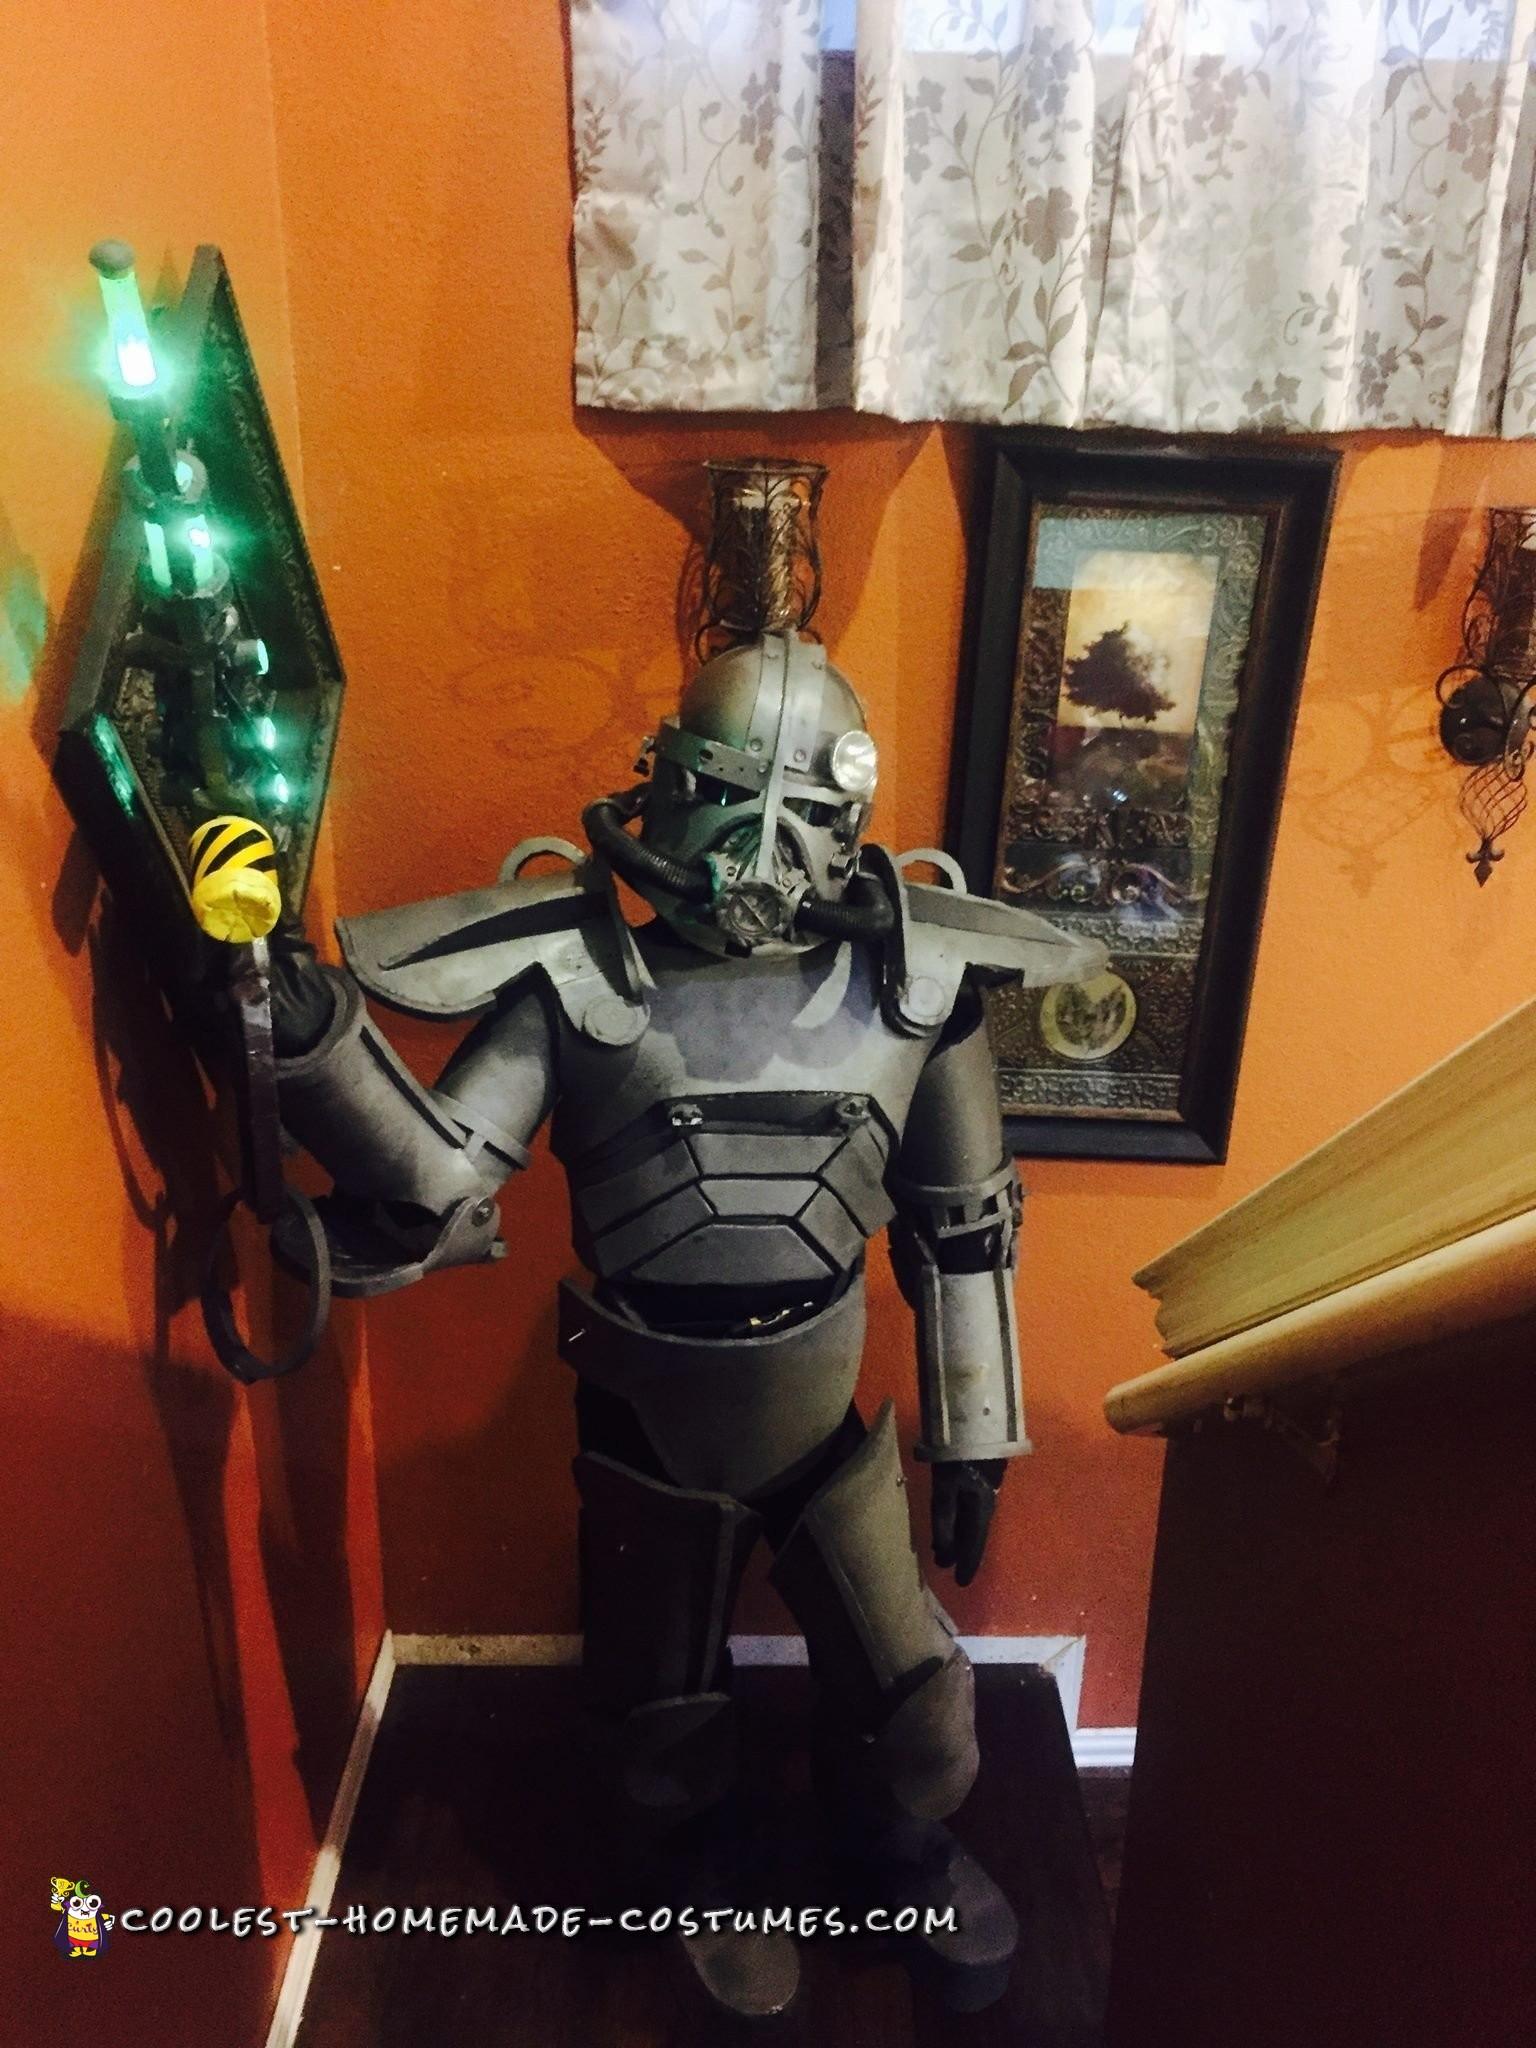 Homemade Fallout 3 Power Armor Costume